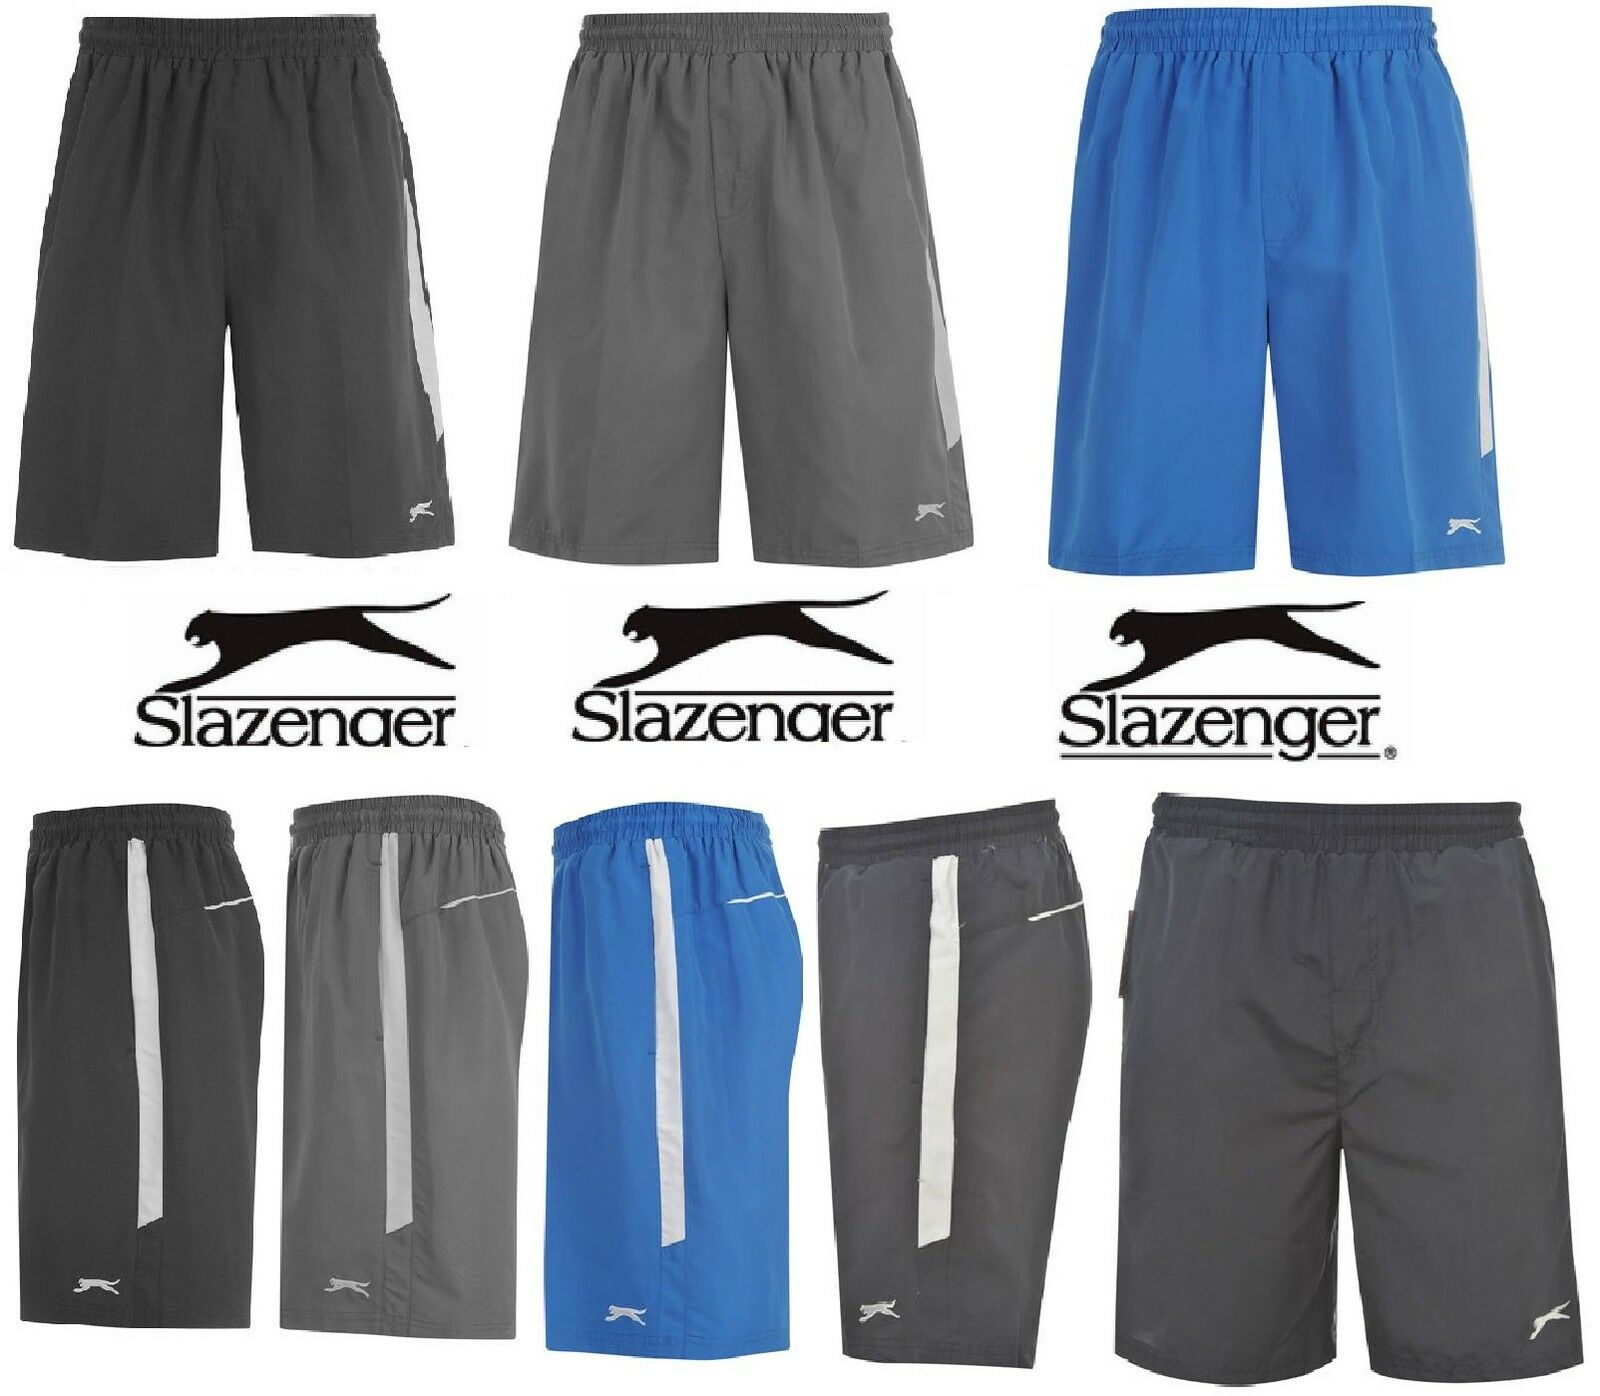 Pantalón corto para hombre Deportivo Slazenger Tejido Gimnasio Correr Casual Tamaño: S M L XL XXL BNWT